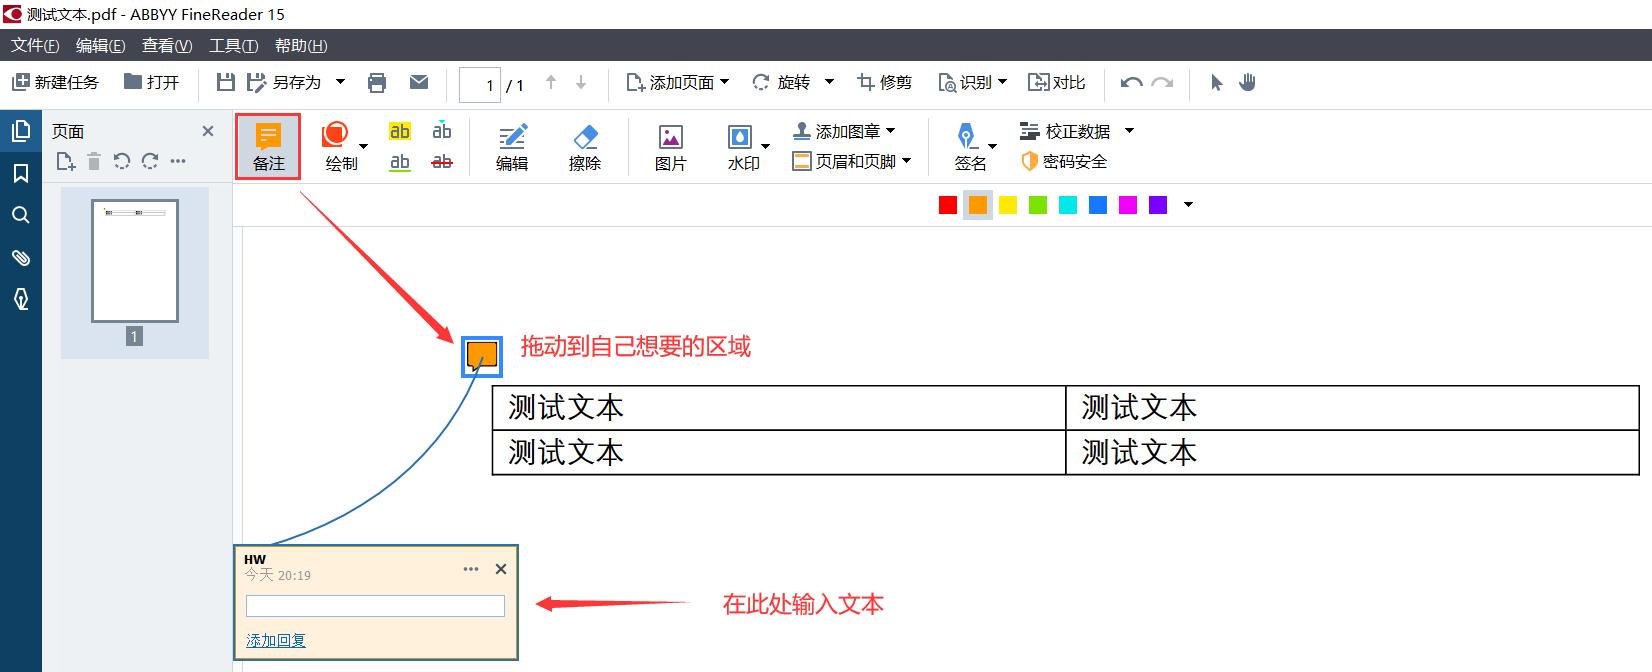 图二:使用ABBYY Finereader 15为PDF文档添加备注